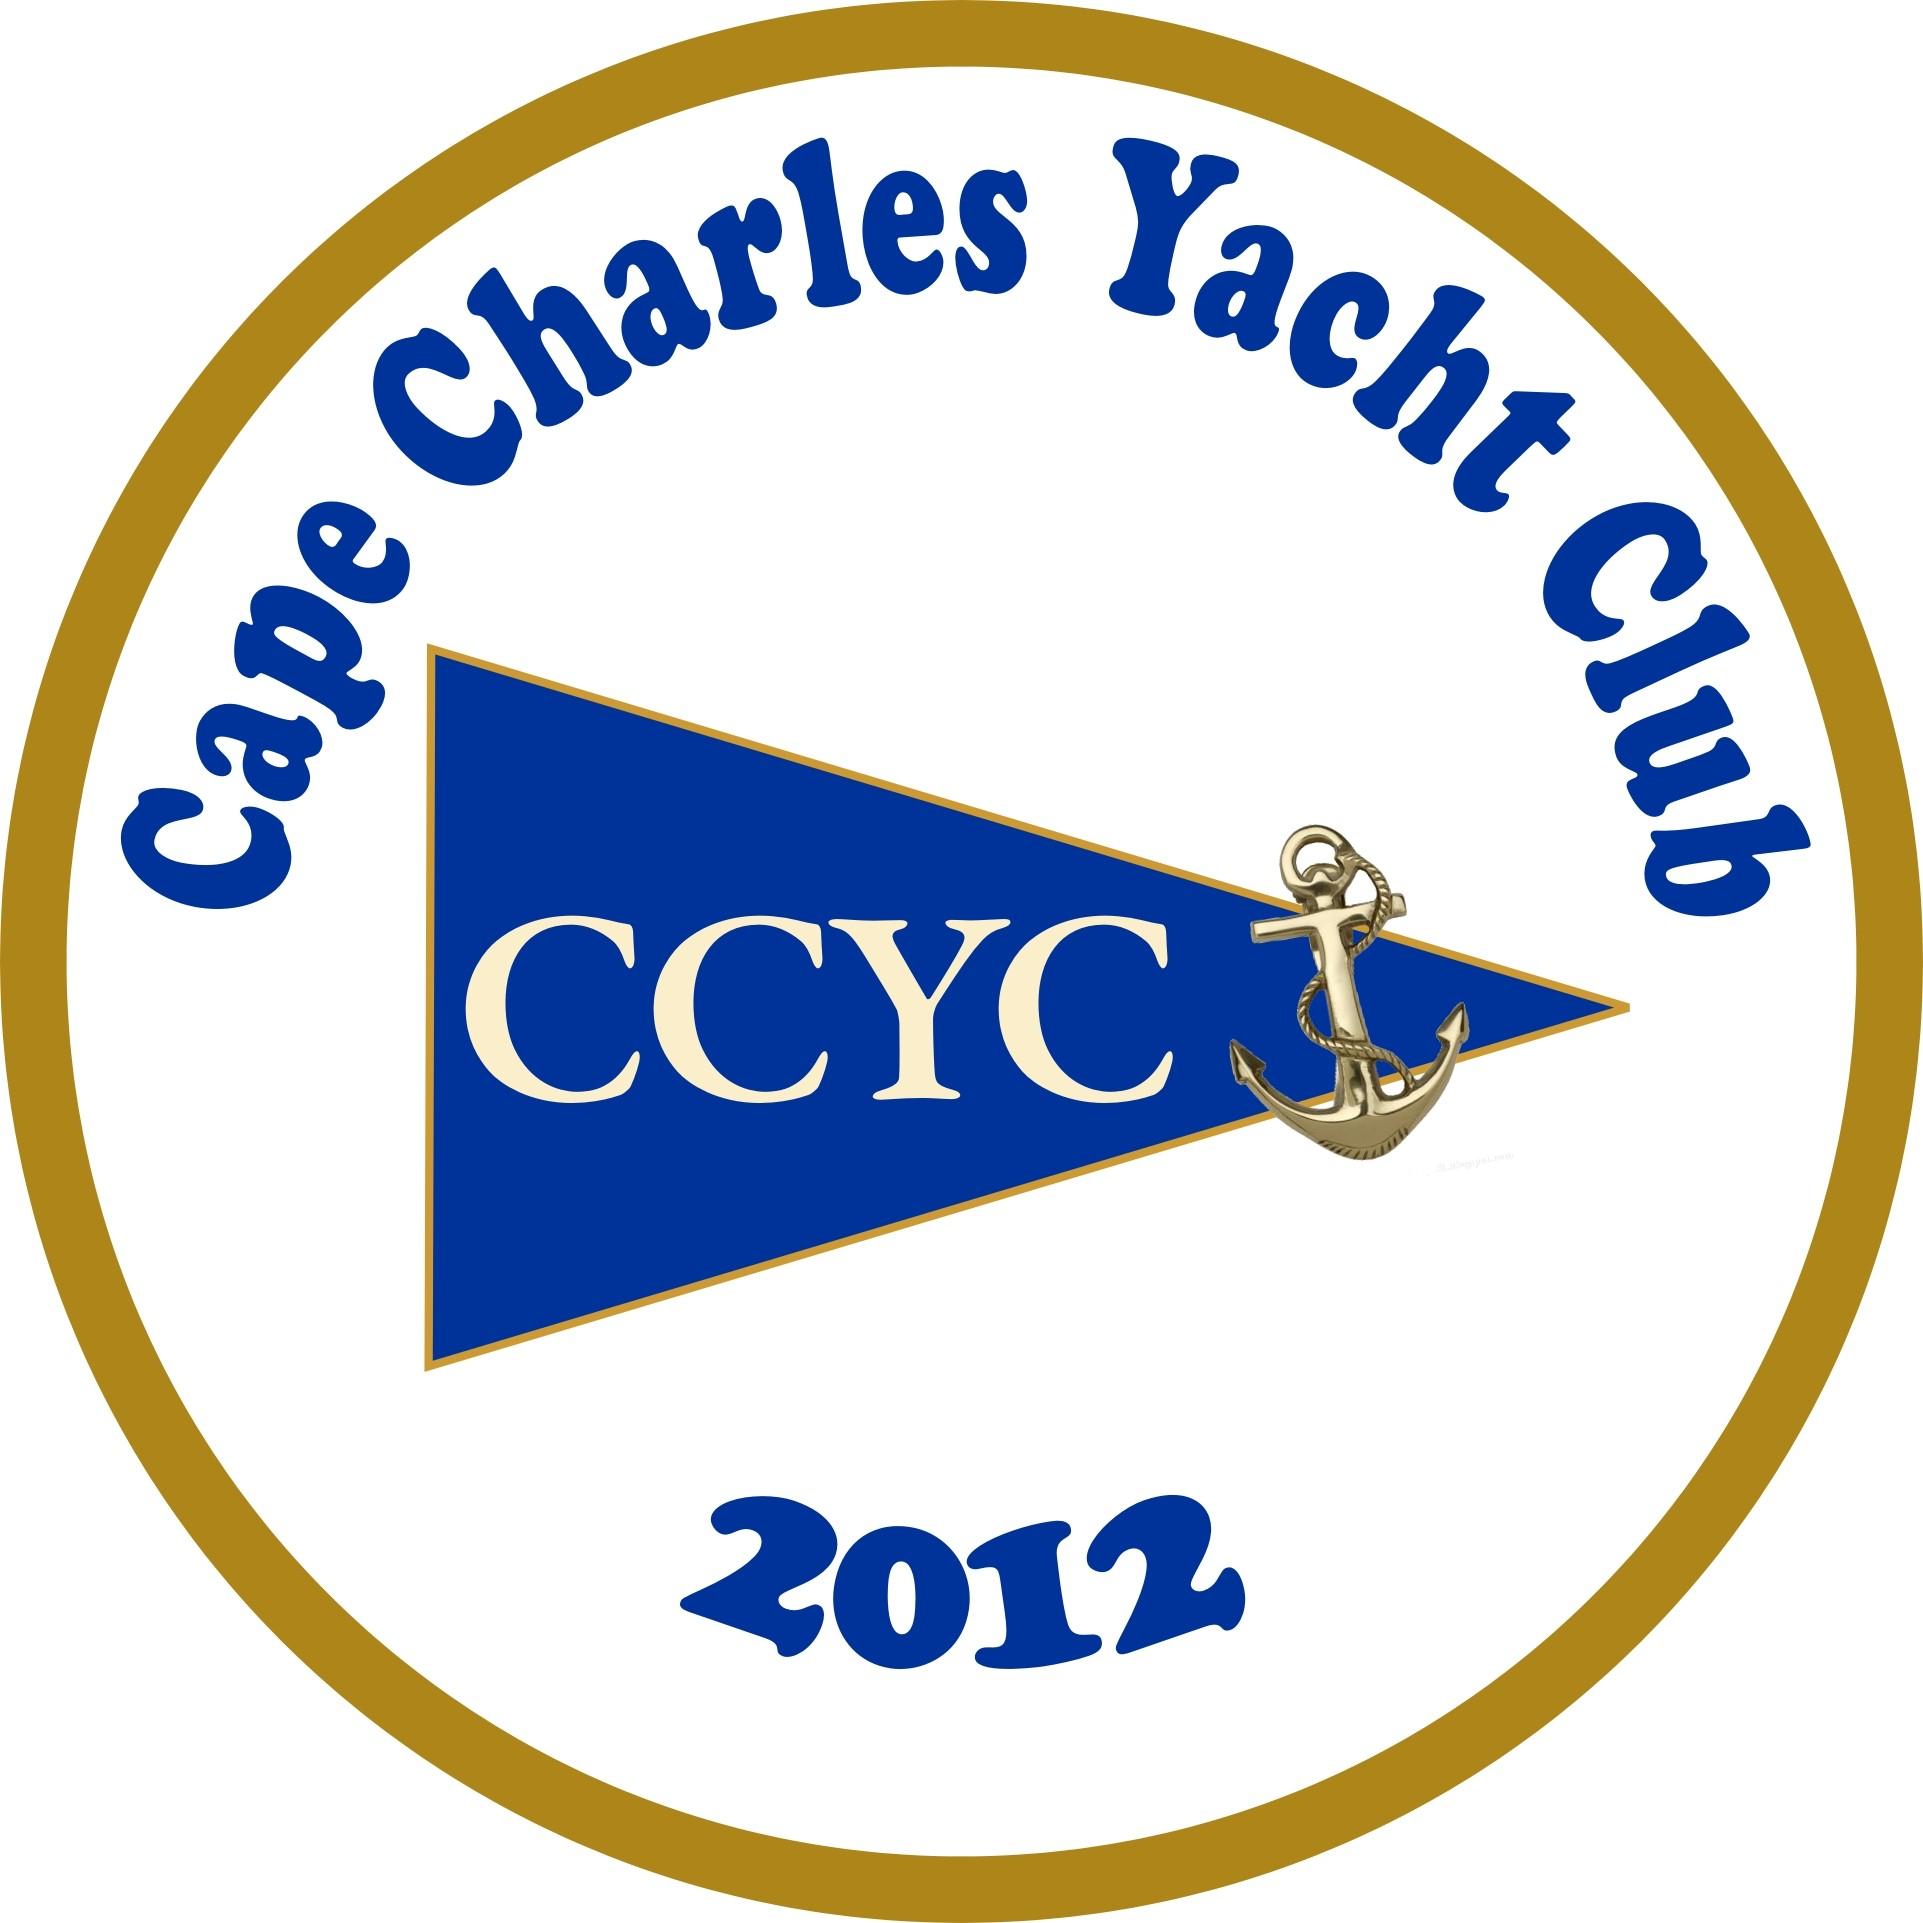 Capecharlesyachtclub Weather